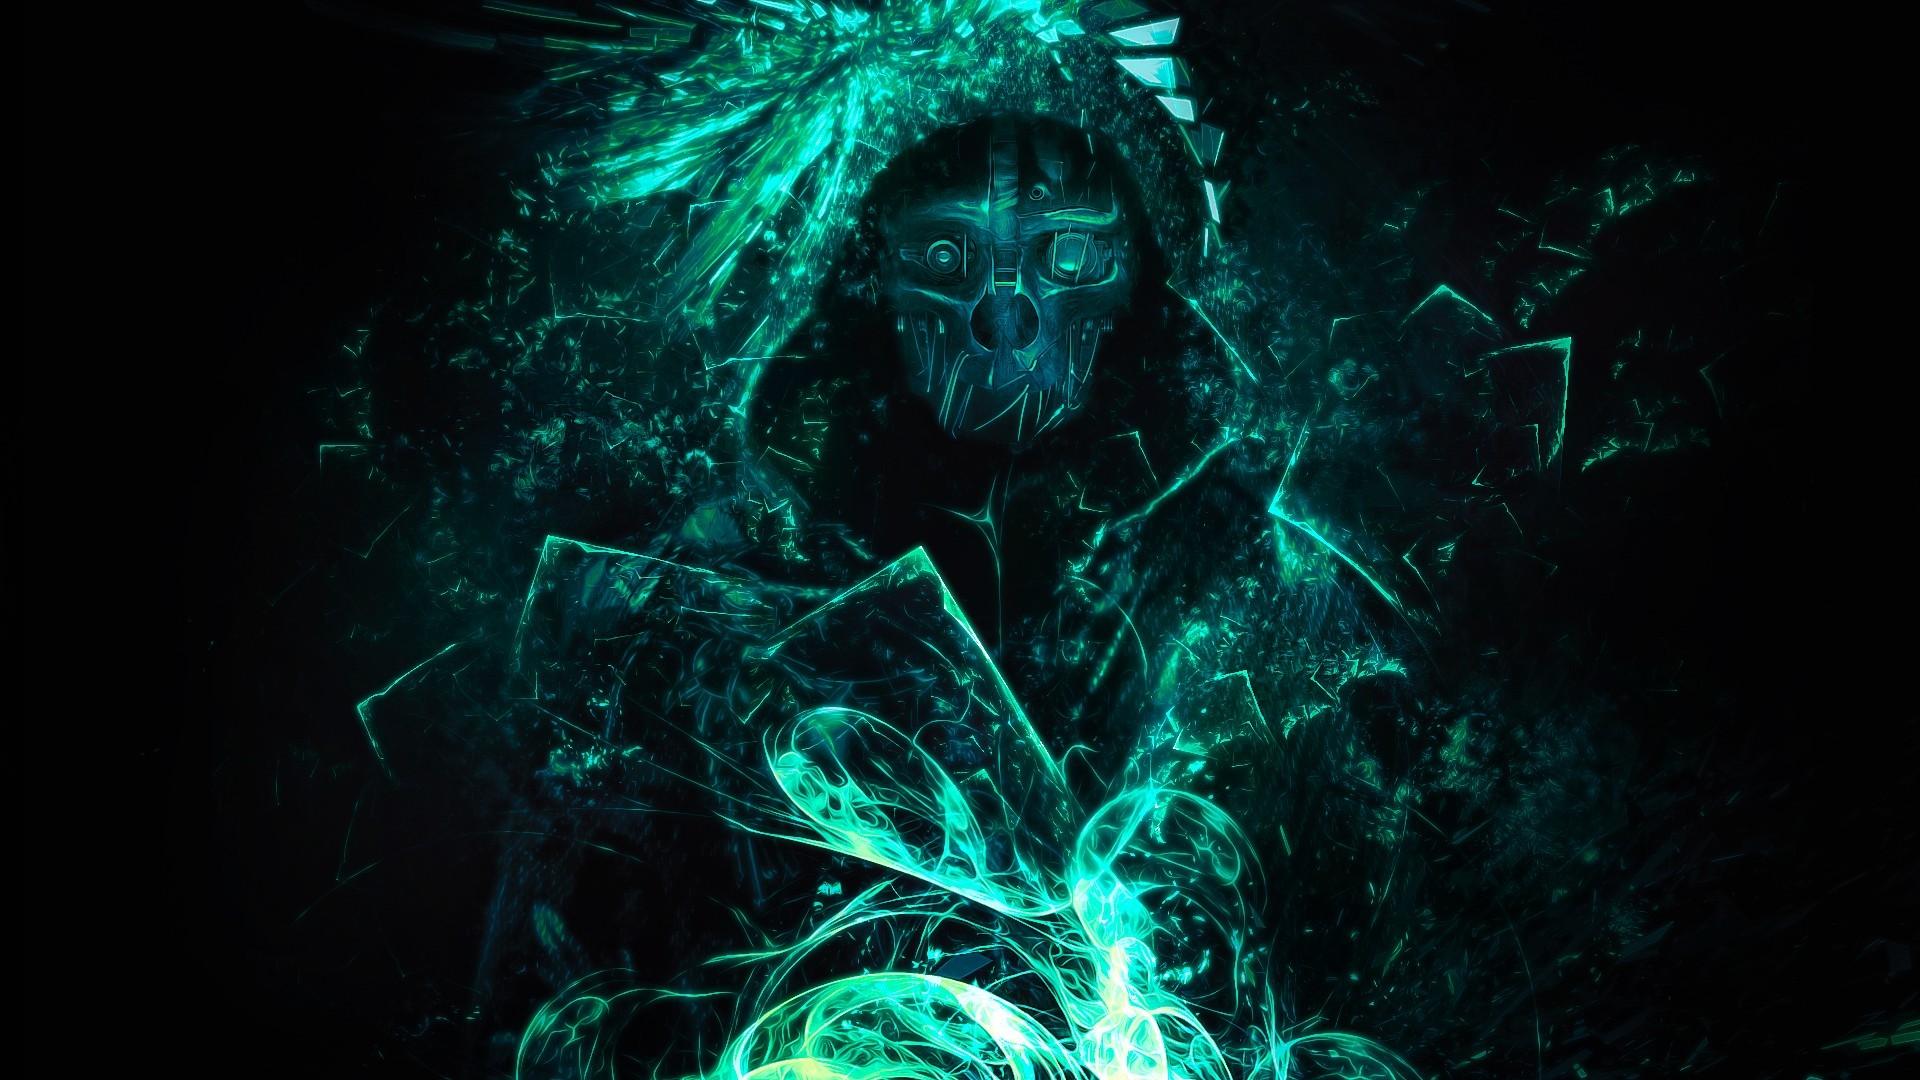 corvo attano artwork dishonored video games glowing dishonored corvo simple background